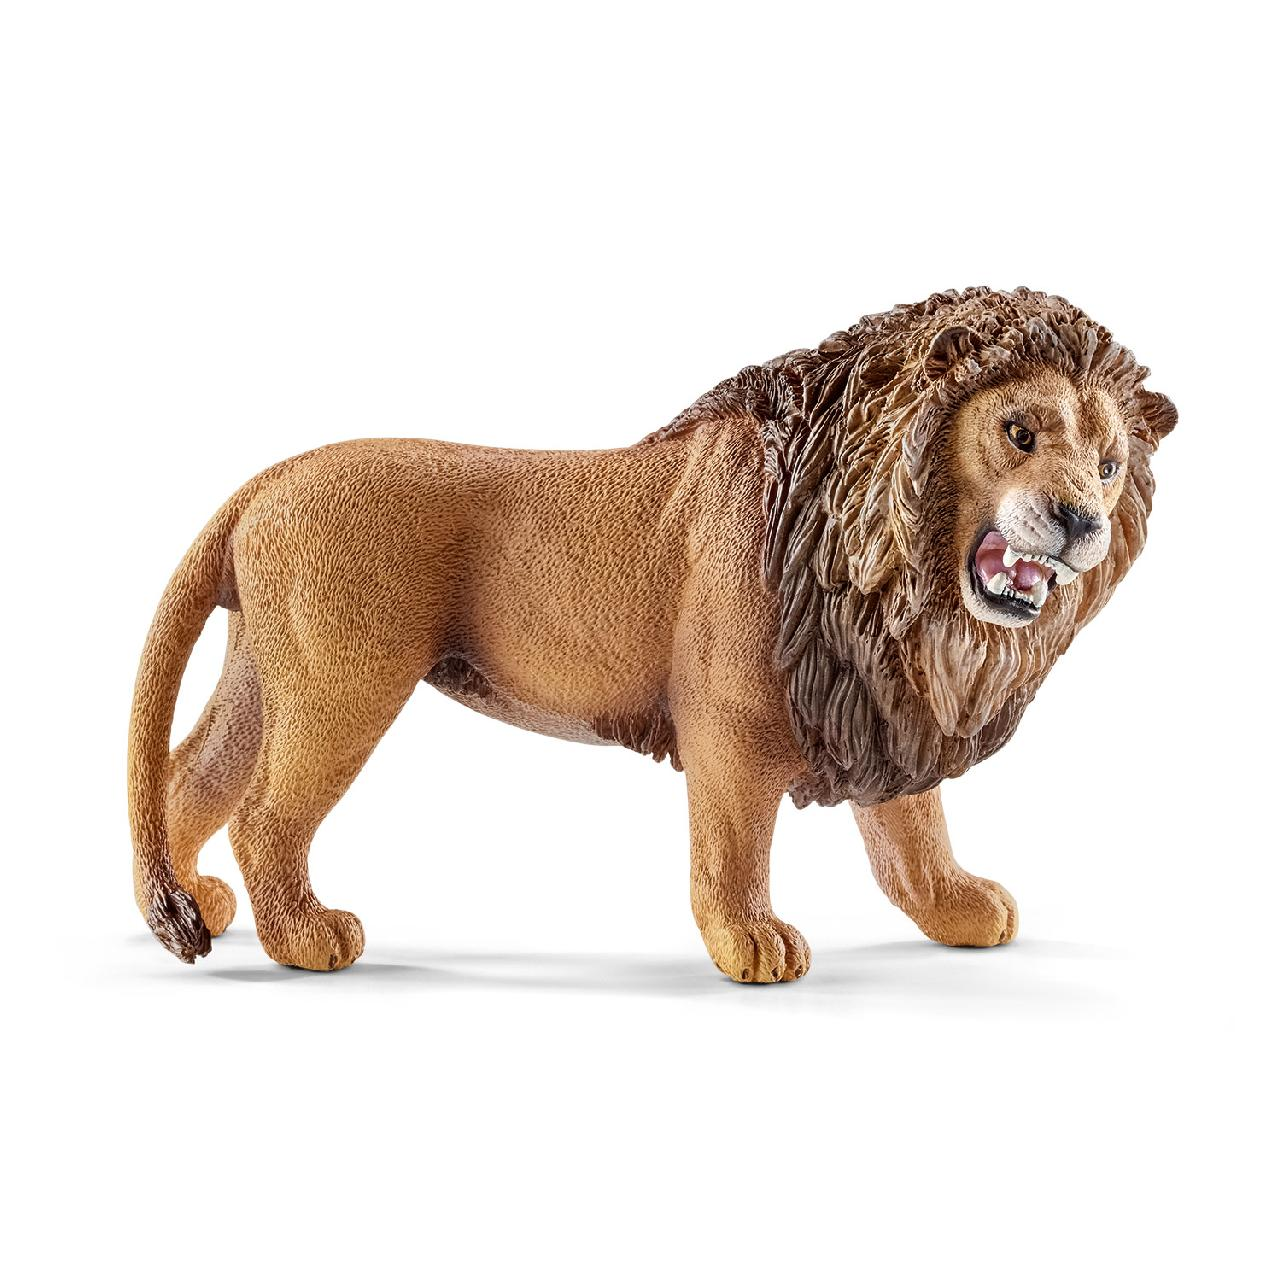 SC14726  ライオン(吠える) シュライヒ・ミニチュア動物シリーズ